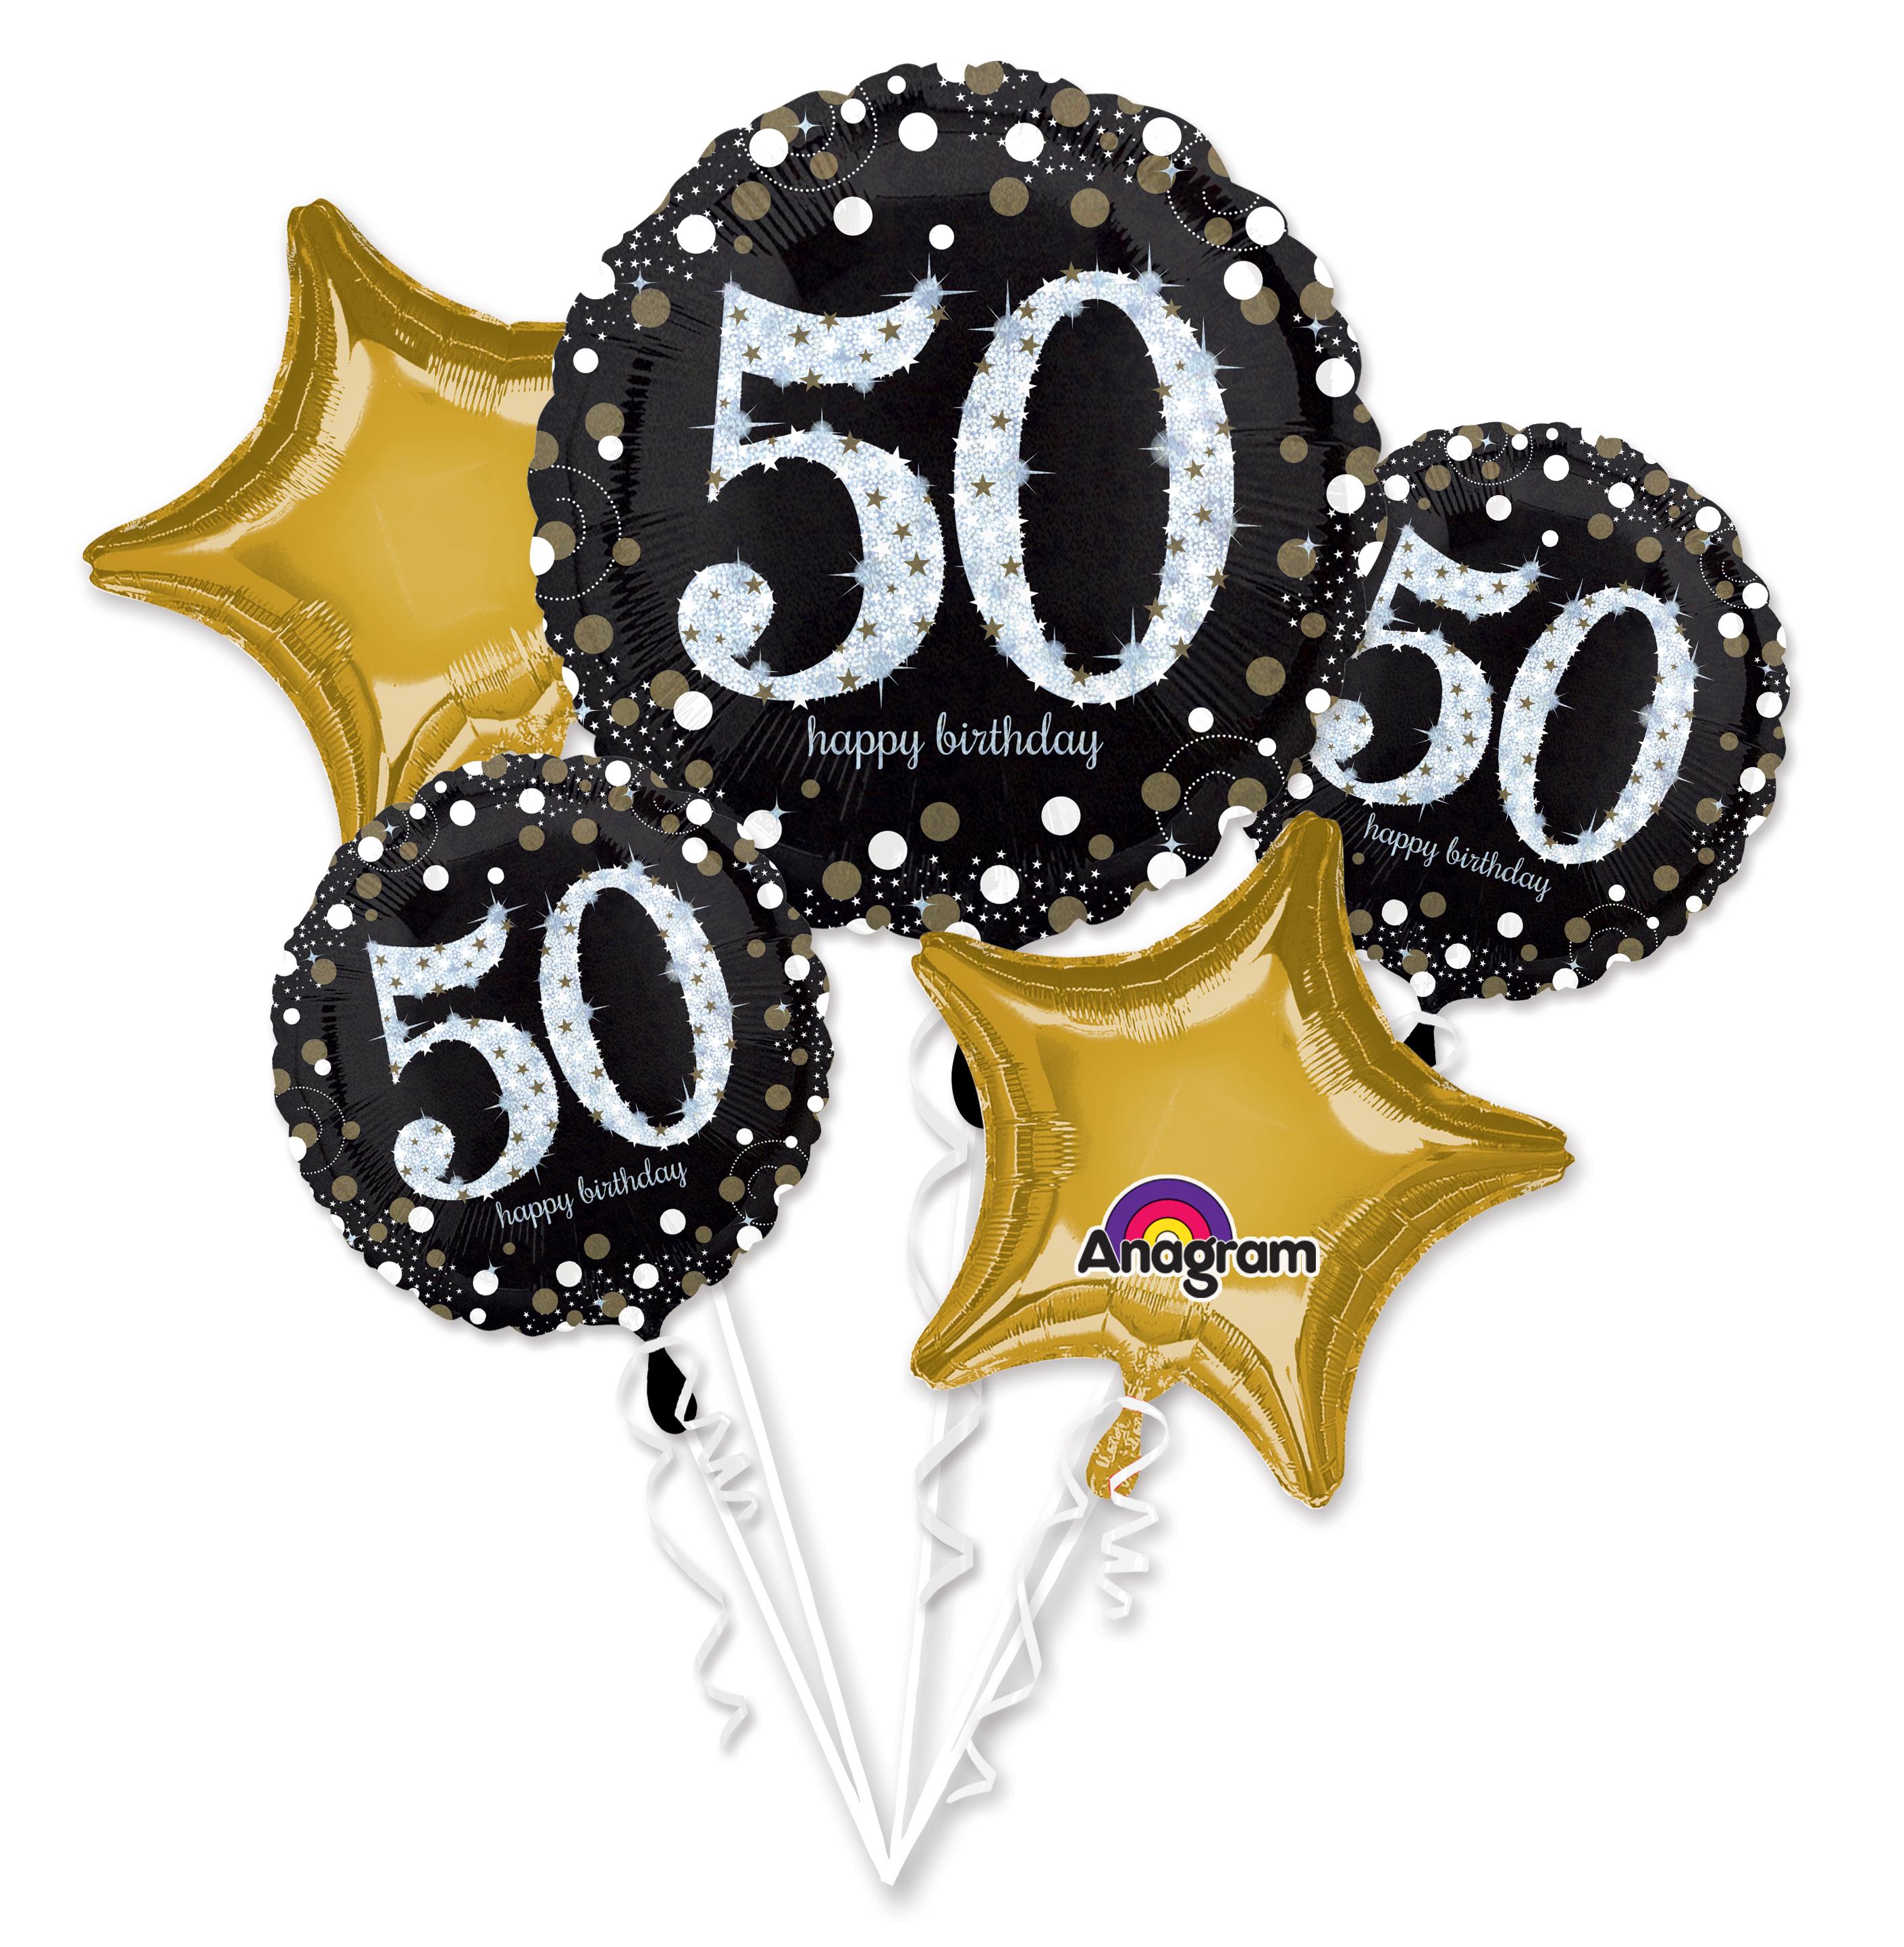 Bouquet Sparkling Birthday 50 Balloon Packaged